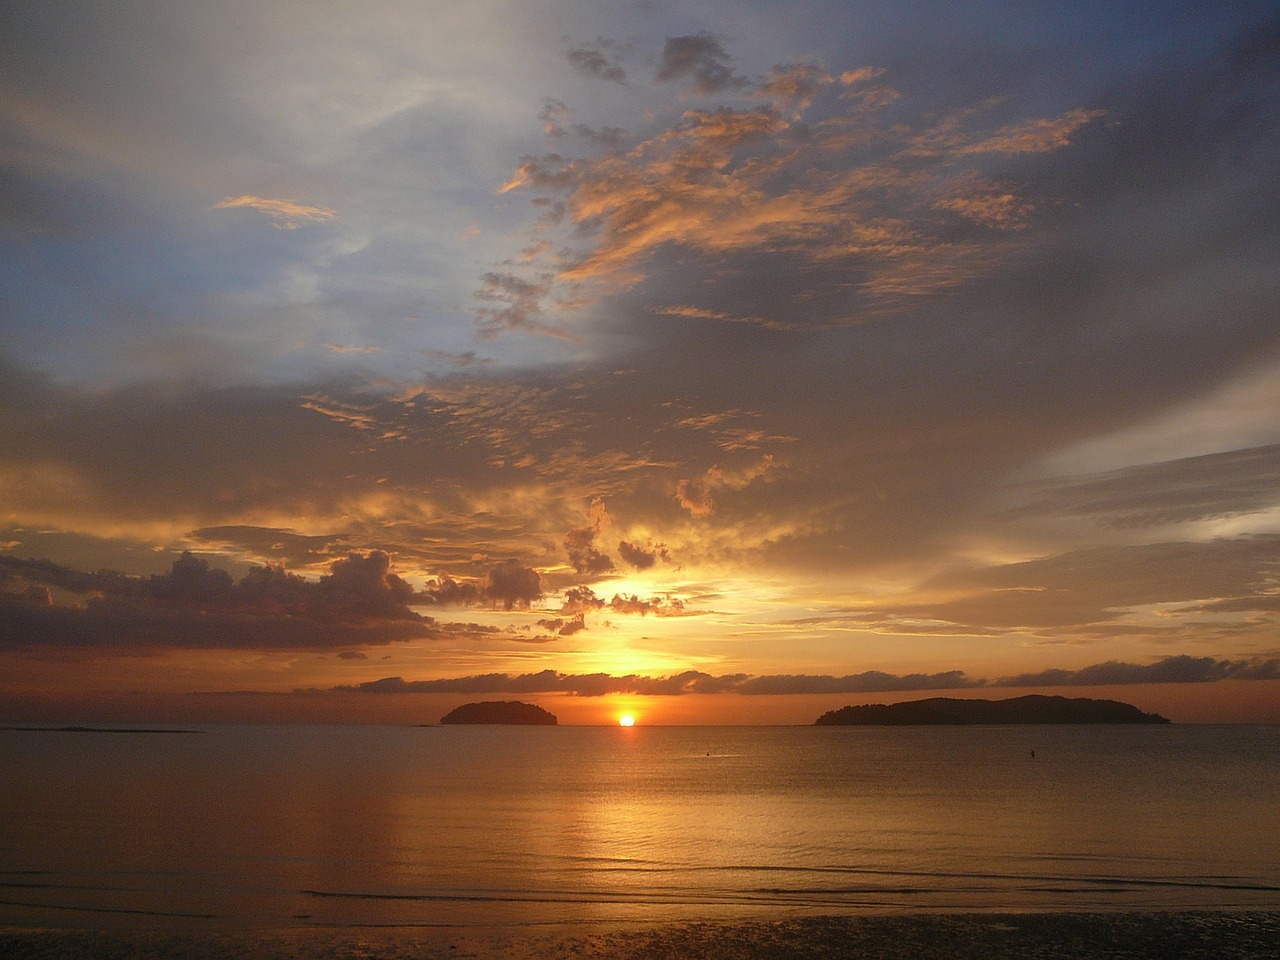 sunset-670098_1280